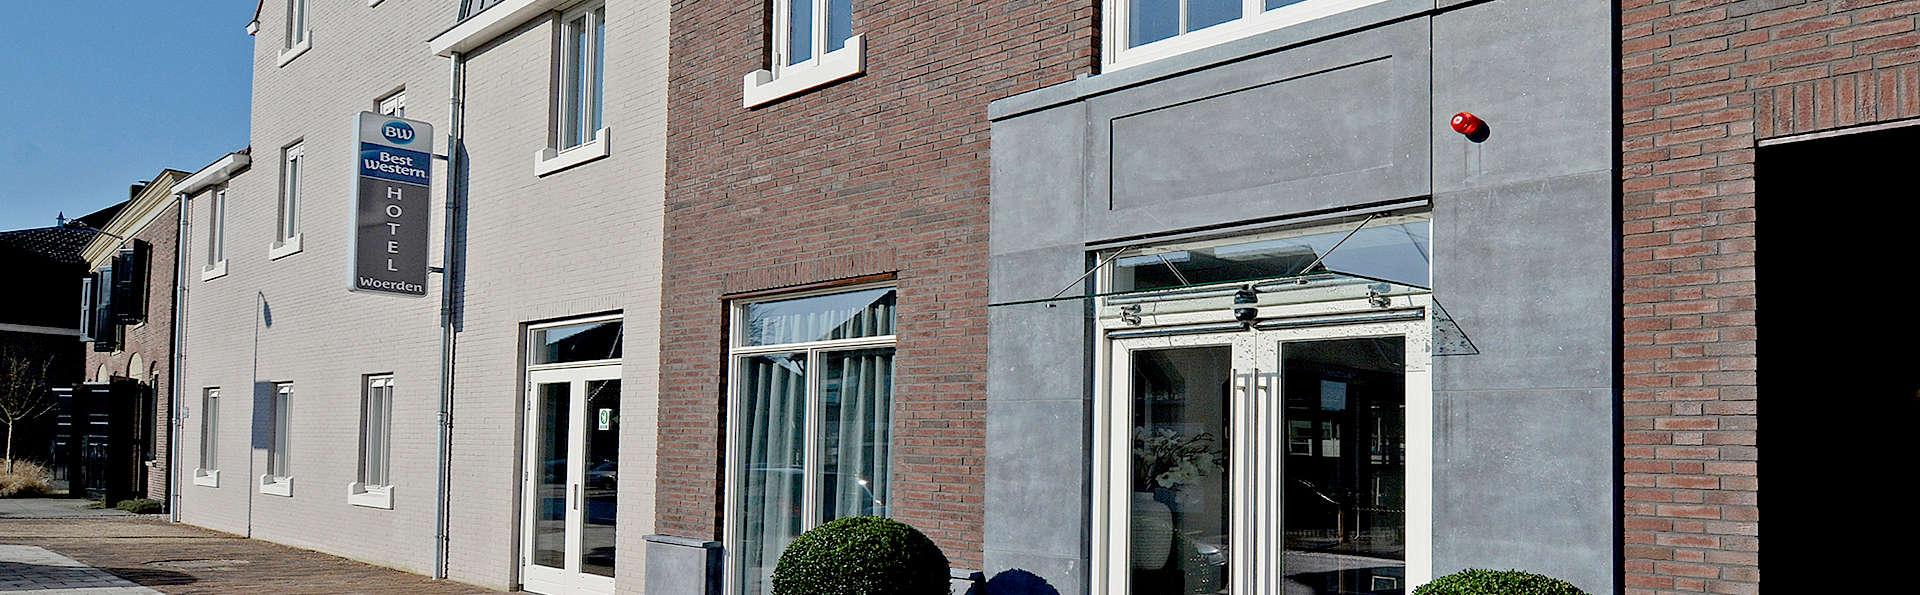 Best Western City Hotel Woerden - Edit_Front.jpg